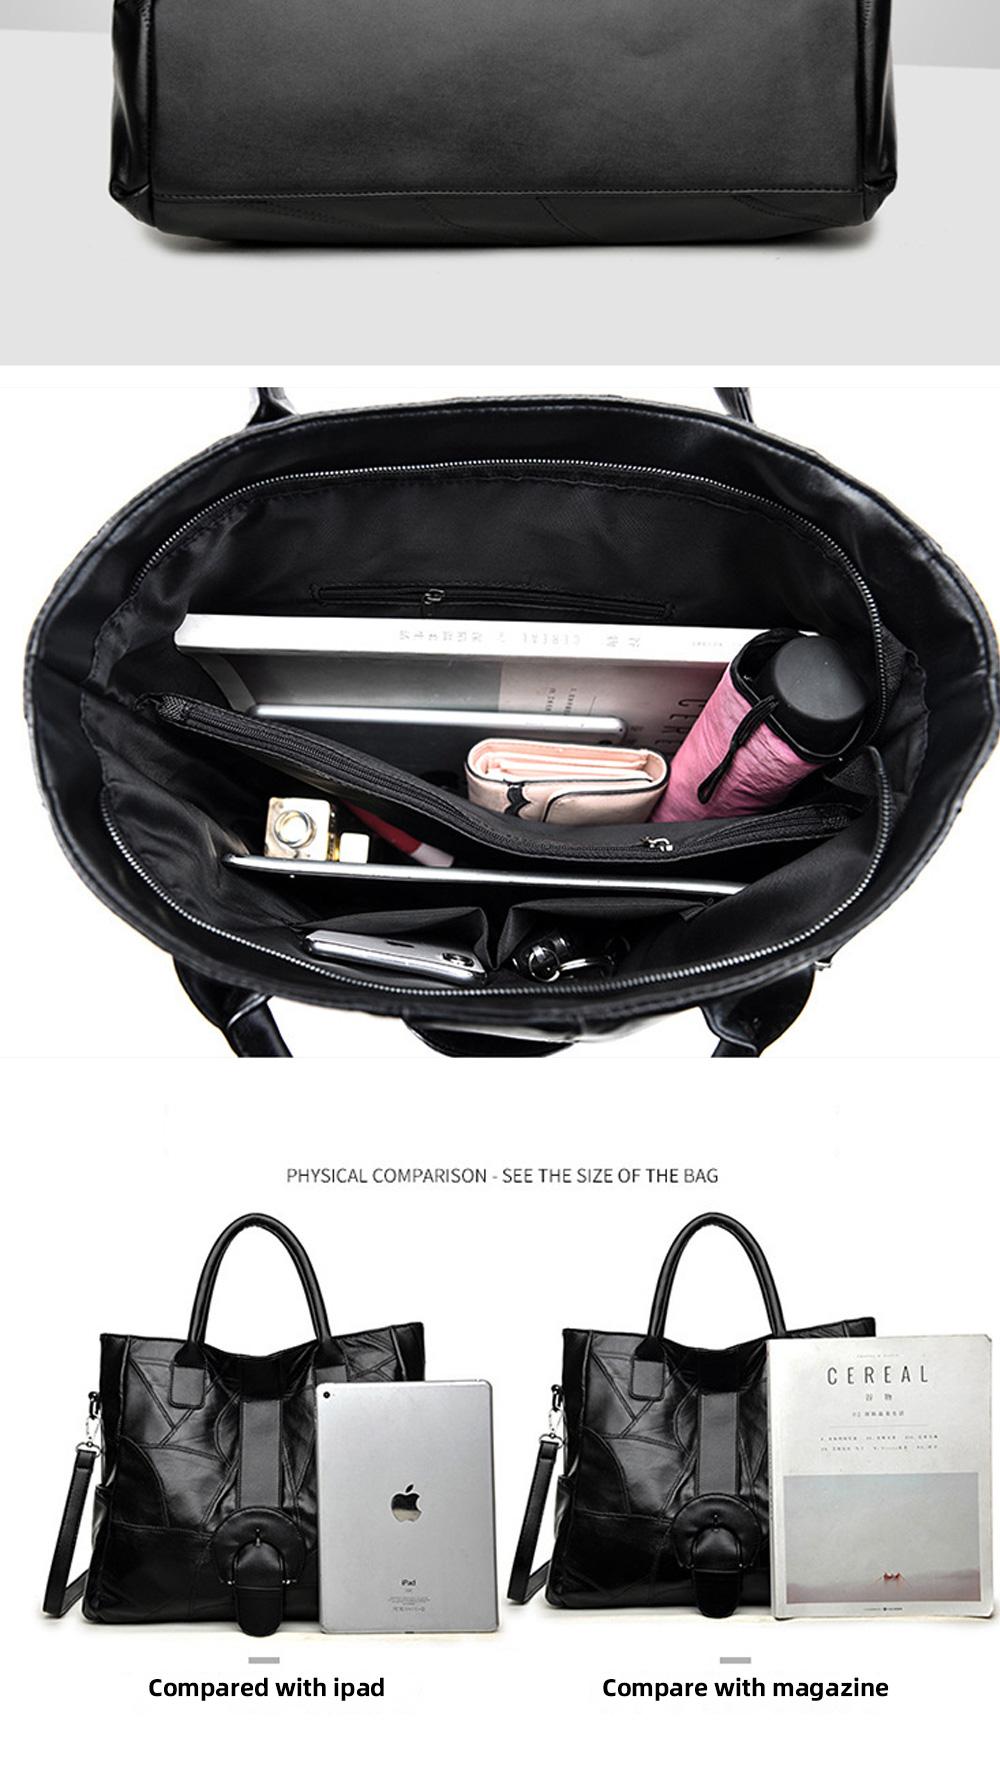 Genuine Leather Handbags Sheepskin Tote Bags, New Large-capacity Shoulder Handbags, Mommy bags Designed for women 33*10*31cm 7